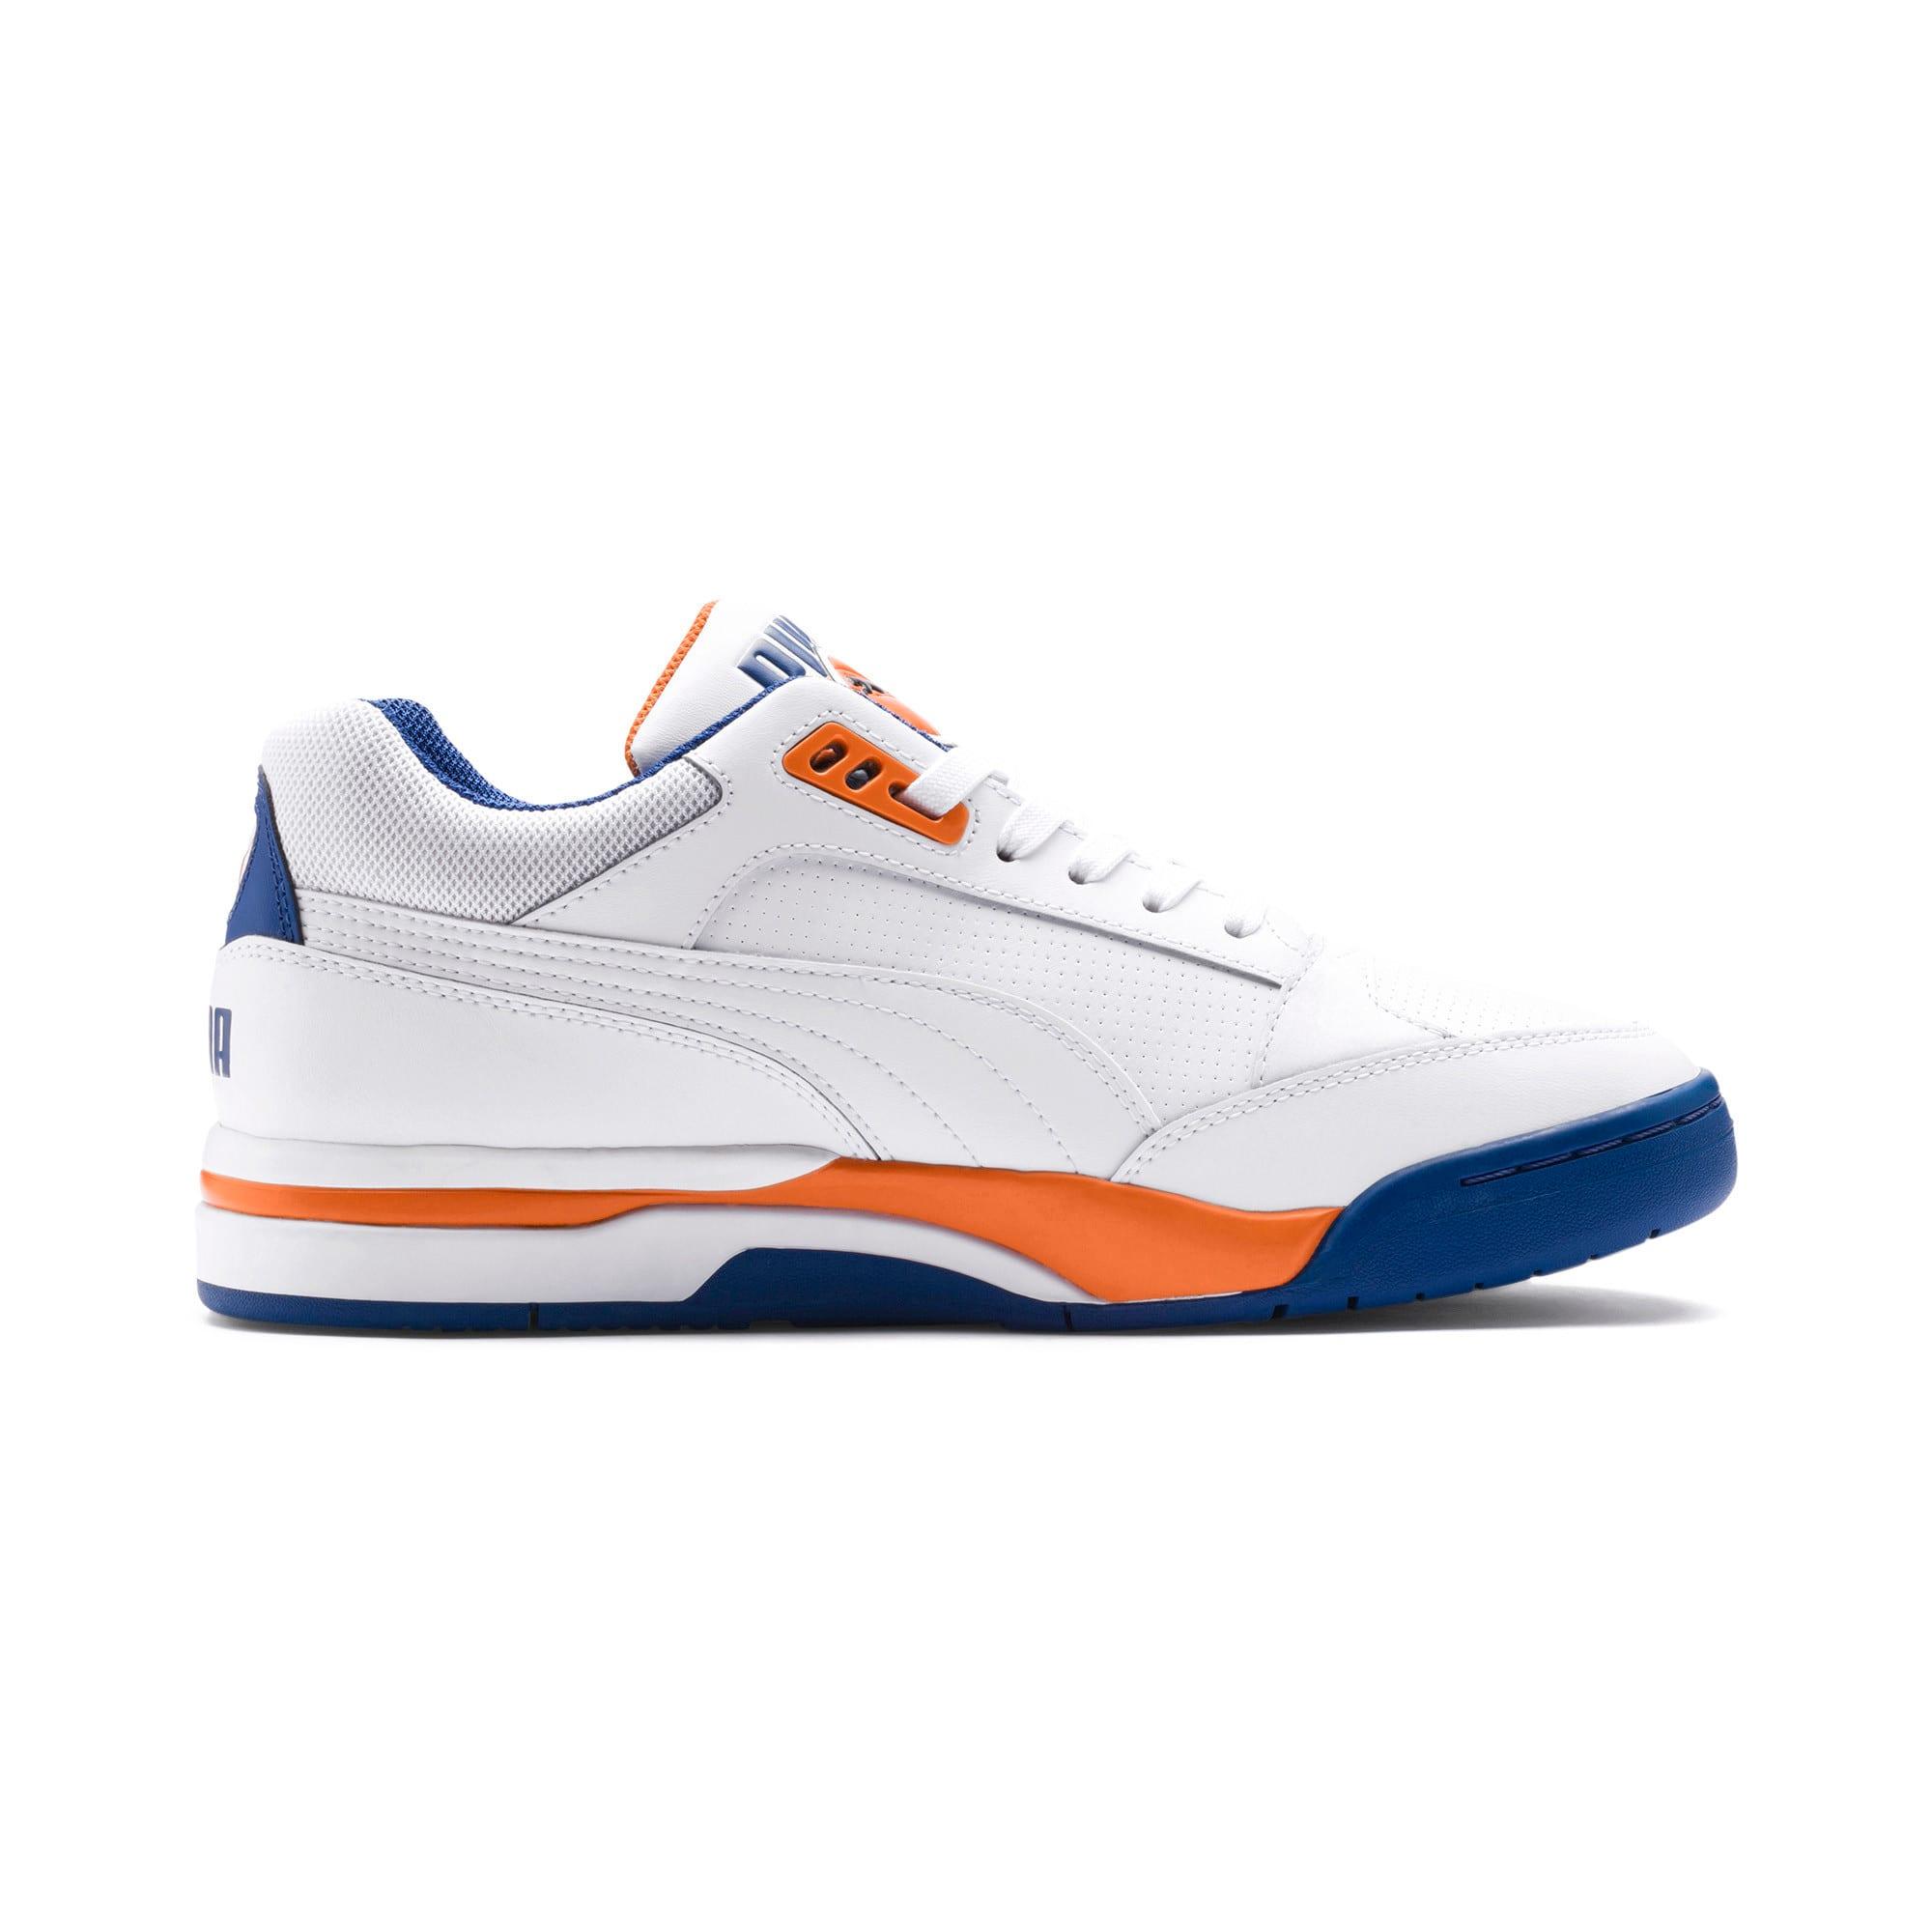 Thumbnail 5 of Palace Guard basketbalschoenen voor heren, P White-Jaffa Orange-G Blue, medium